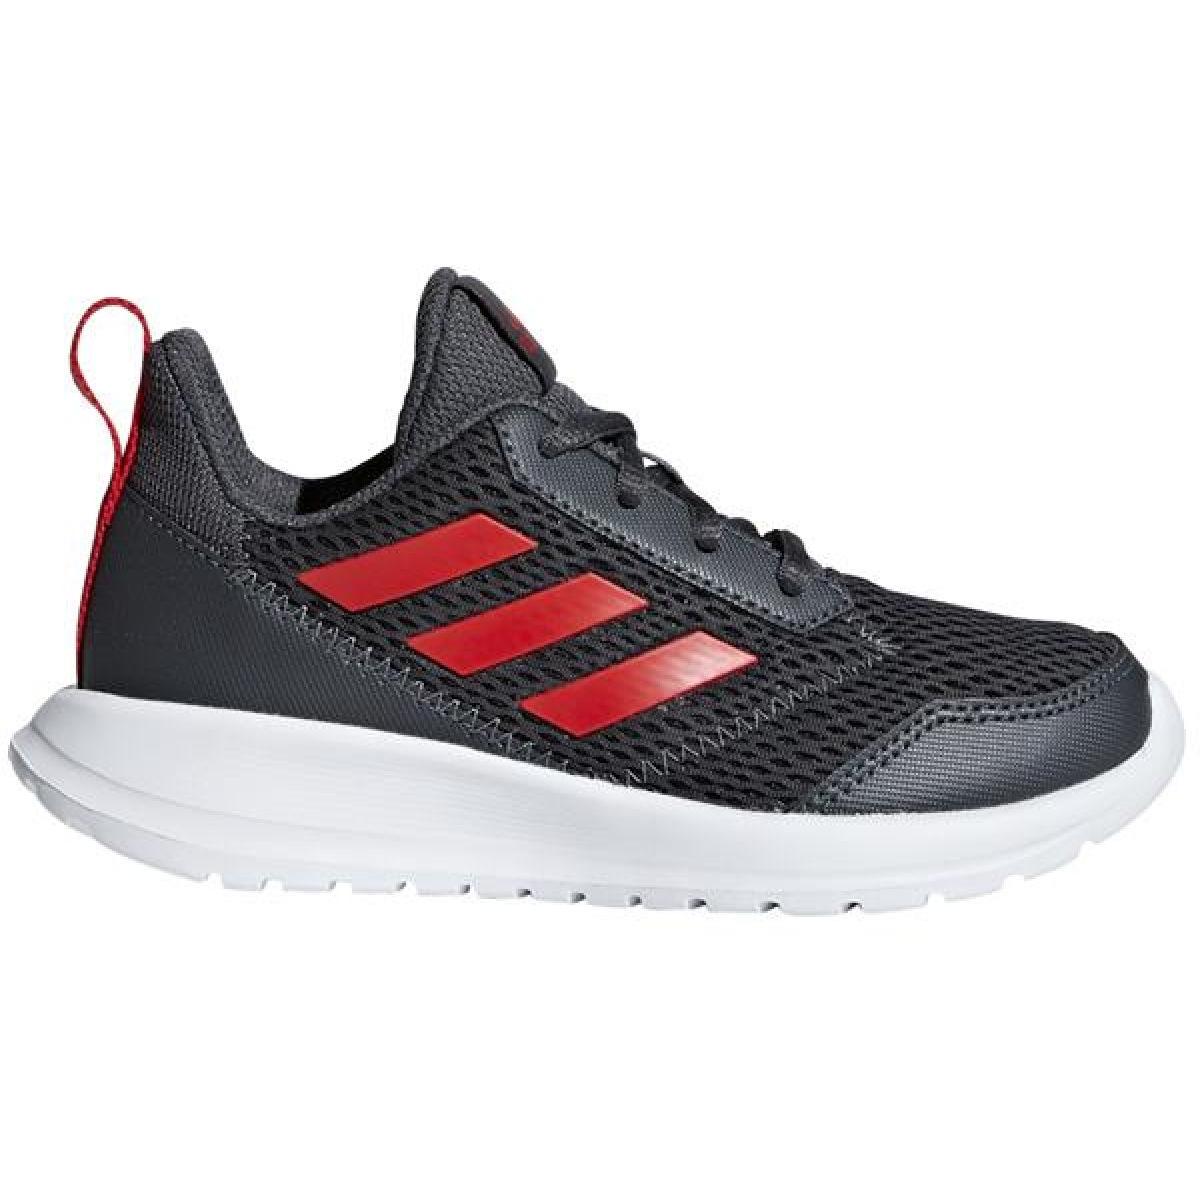 Adidas AltaRun K Jr CG6020 cipő szürke